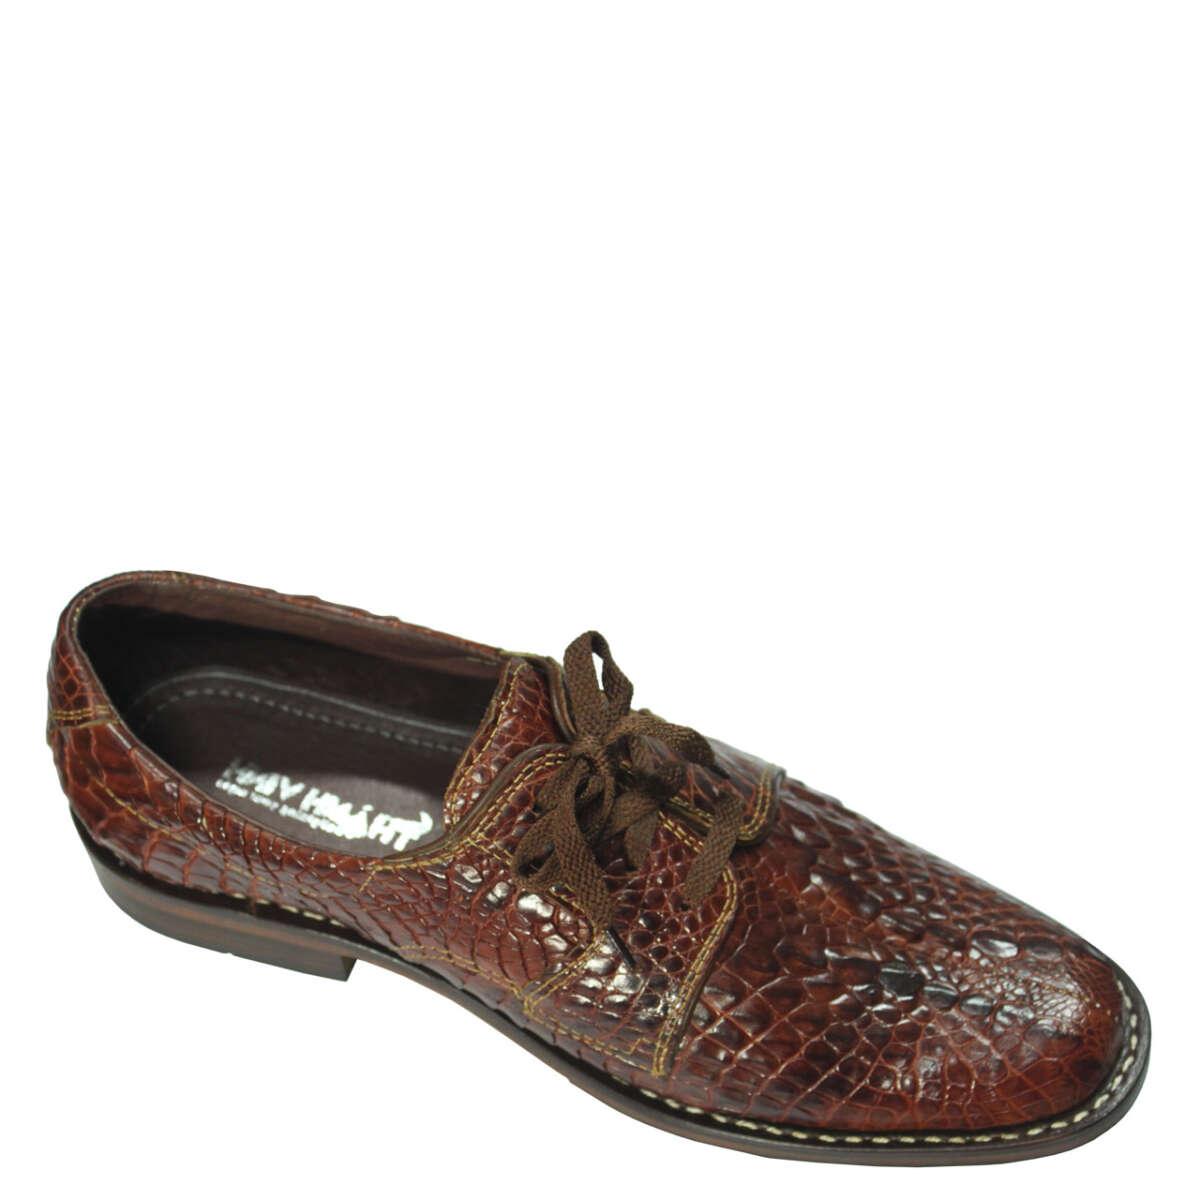 Giày nam da cá sấu S864a